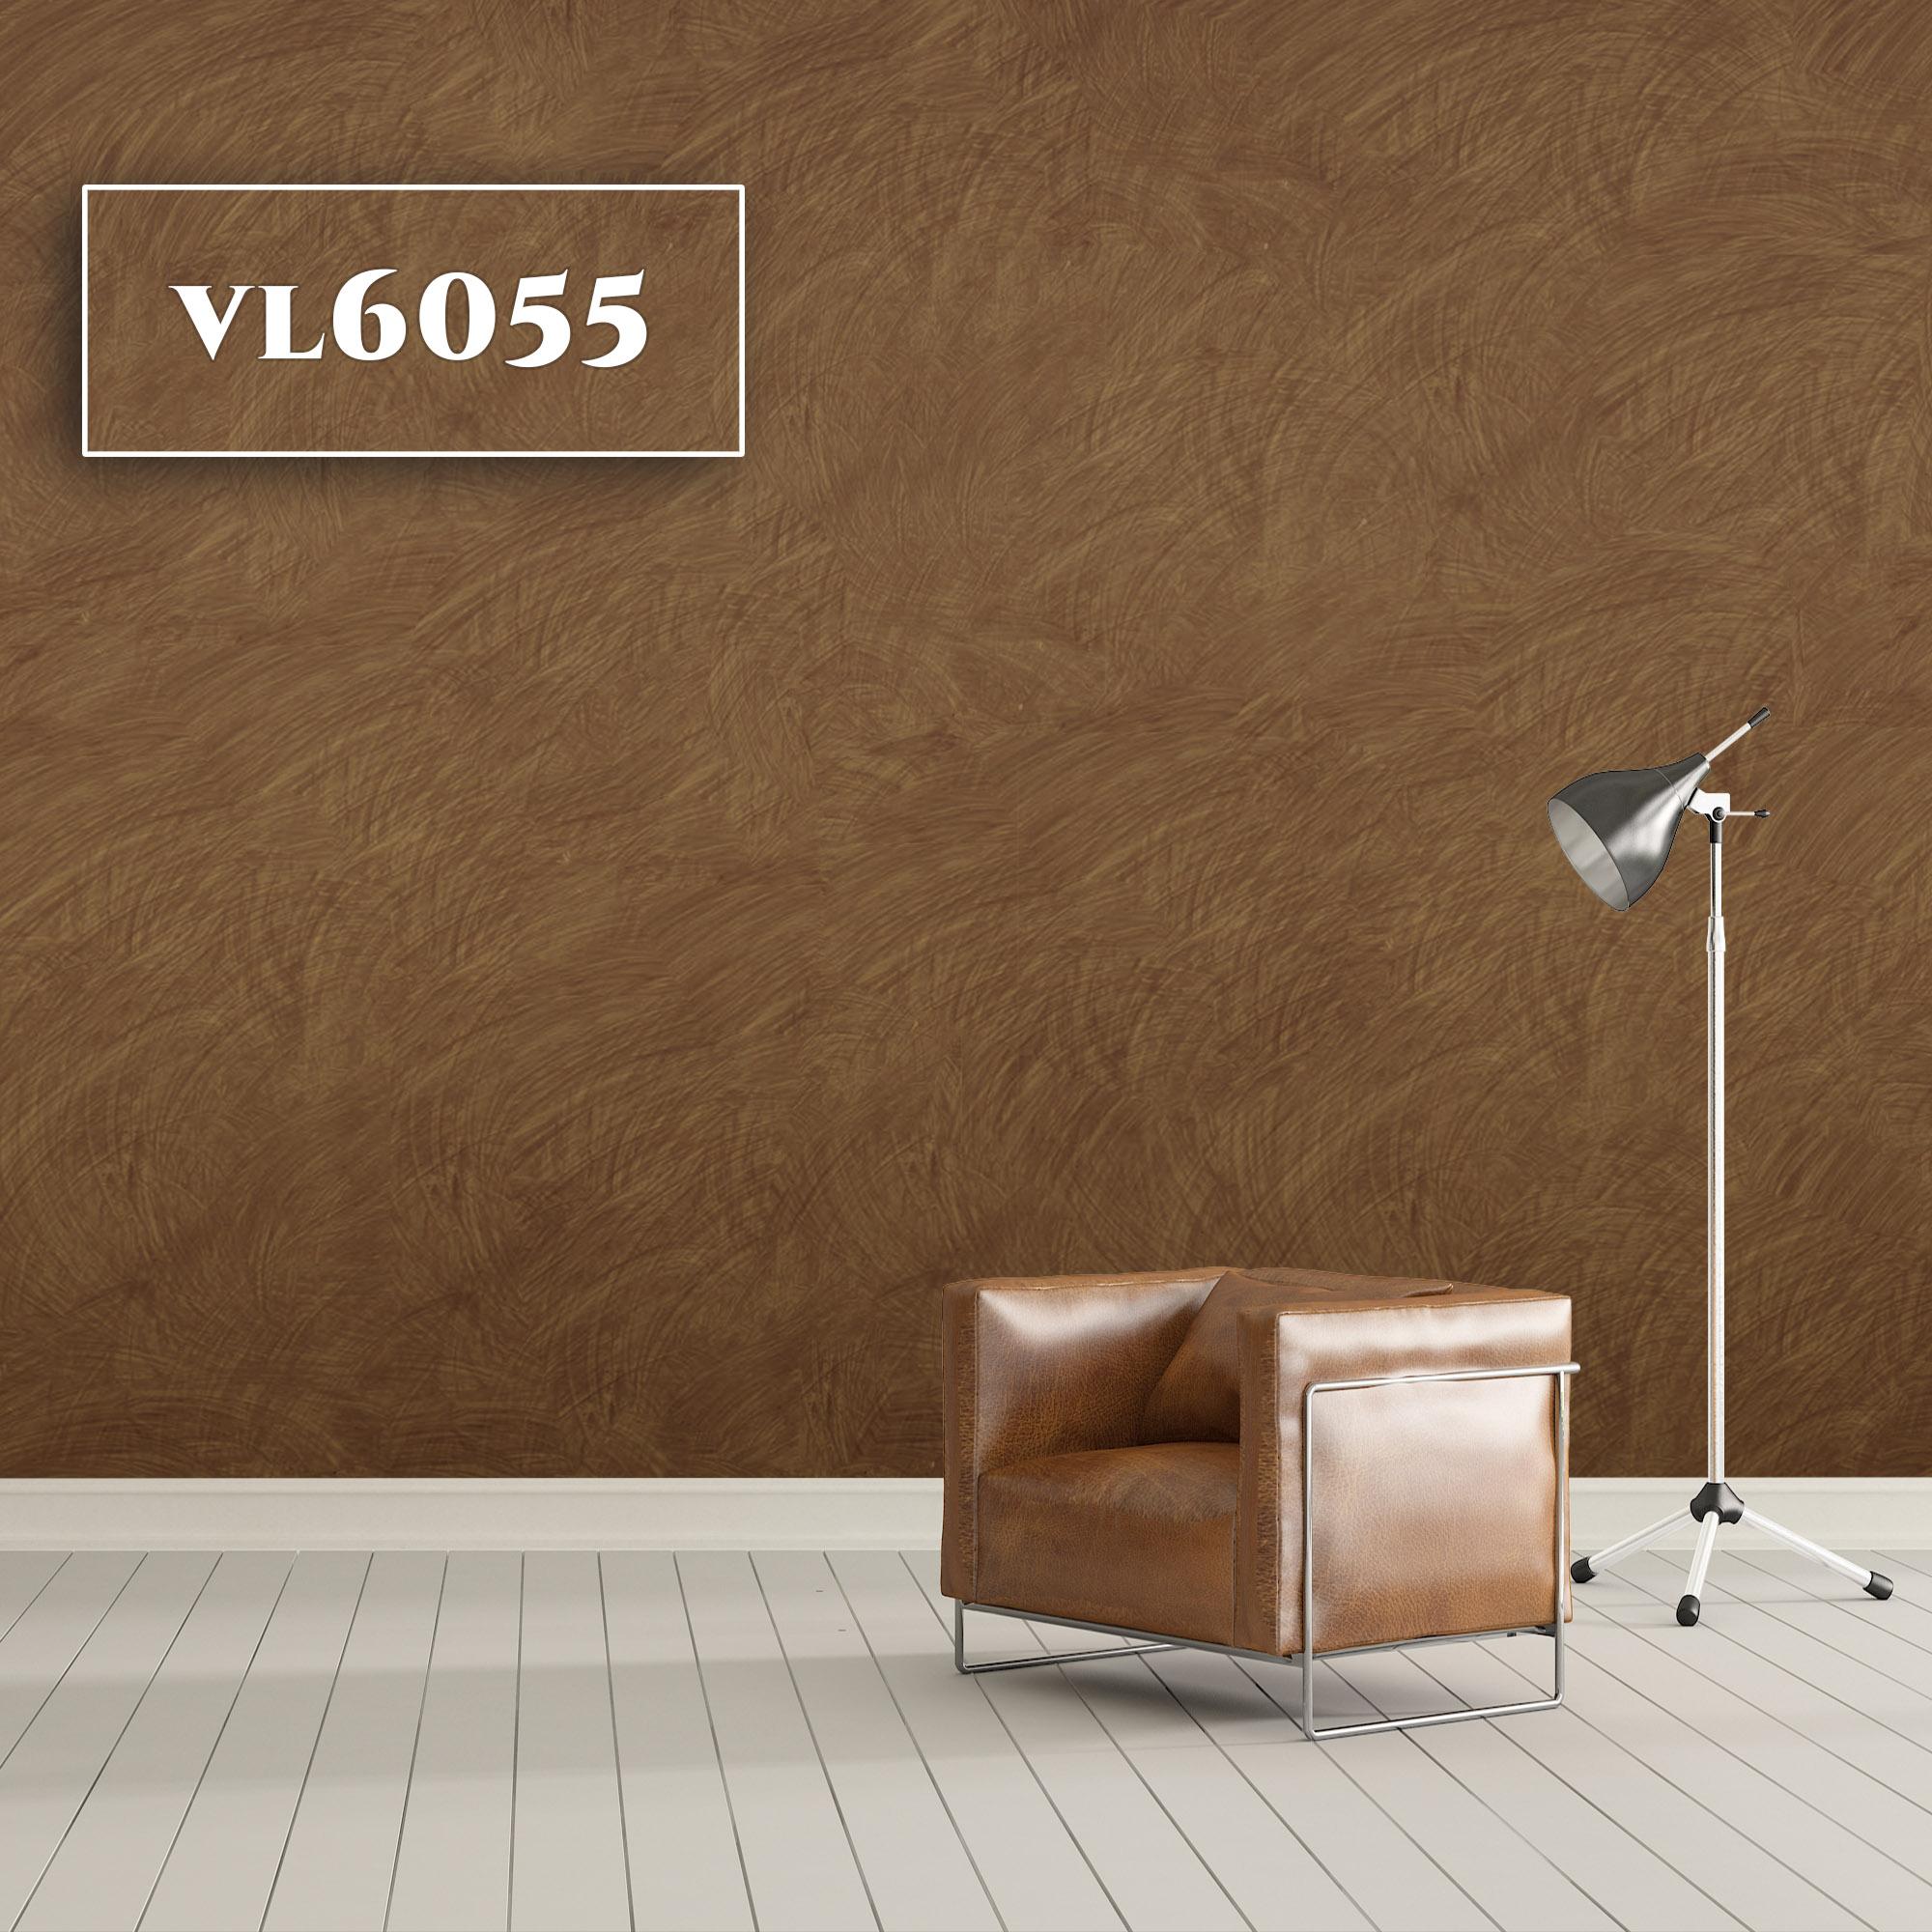 VL6055